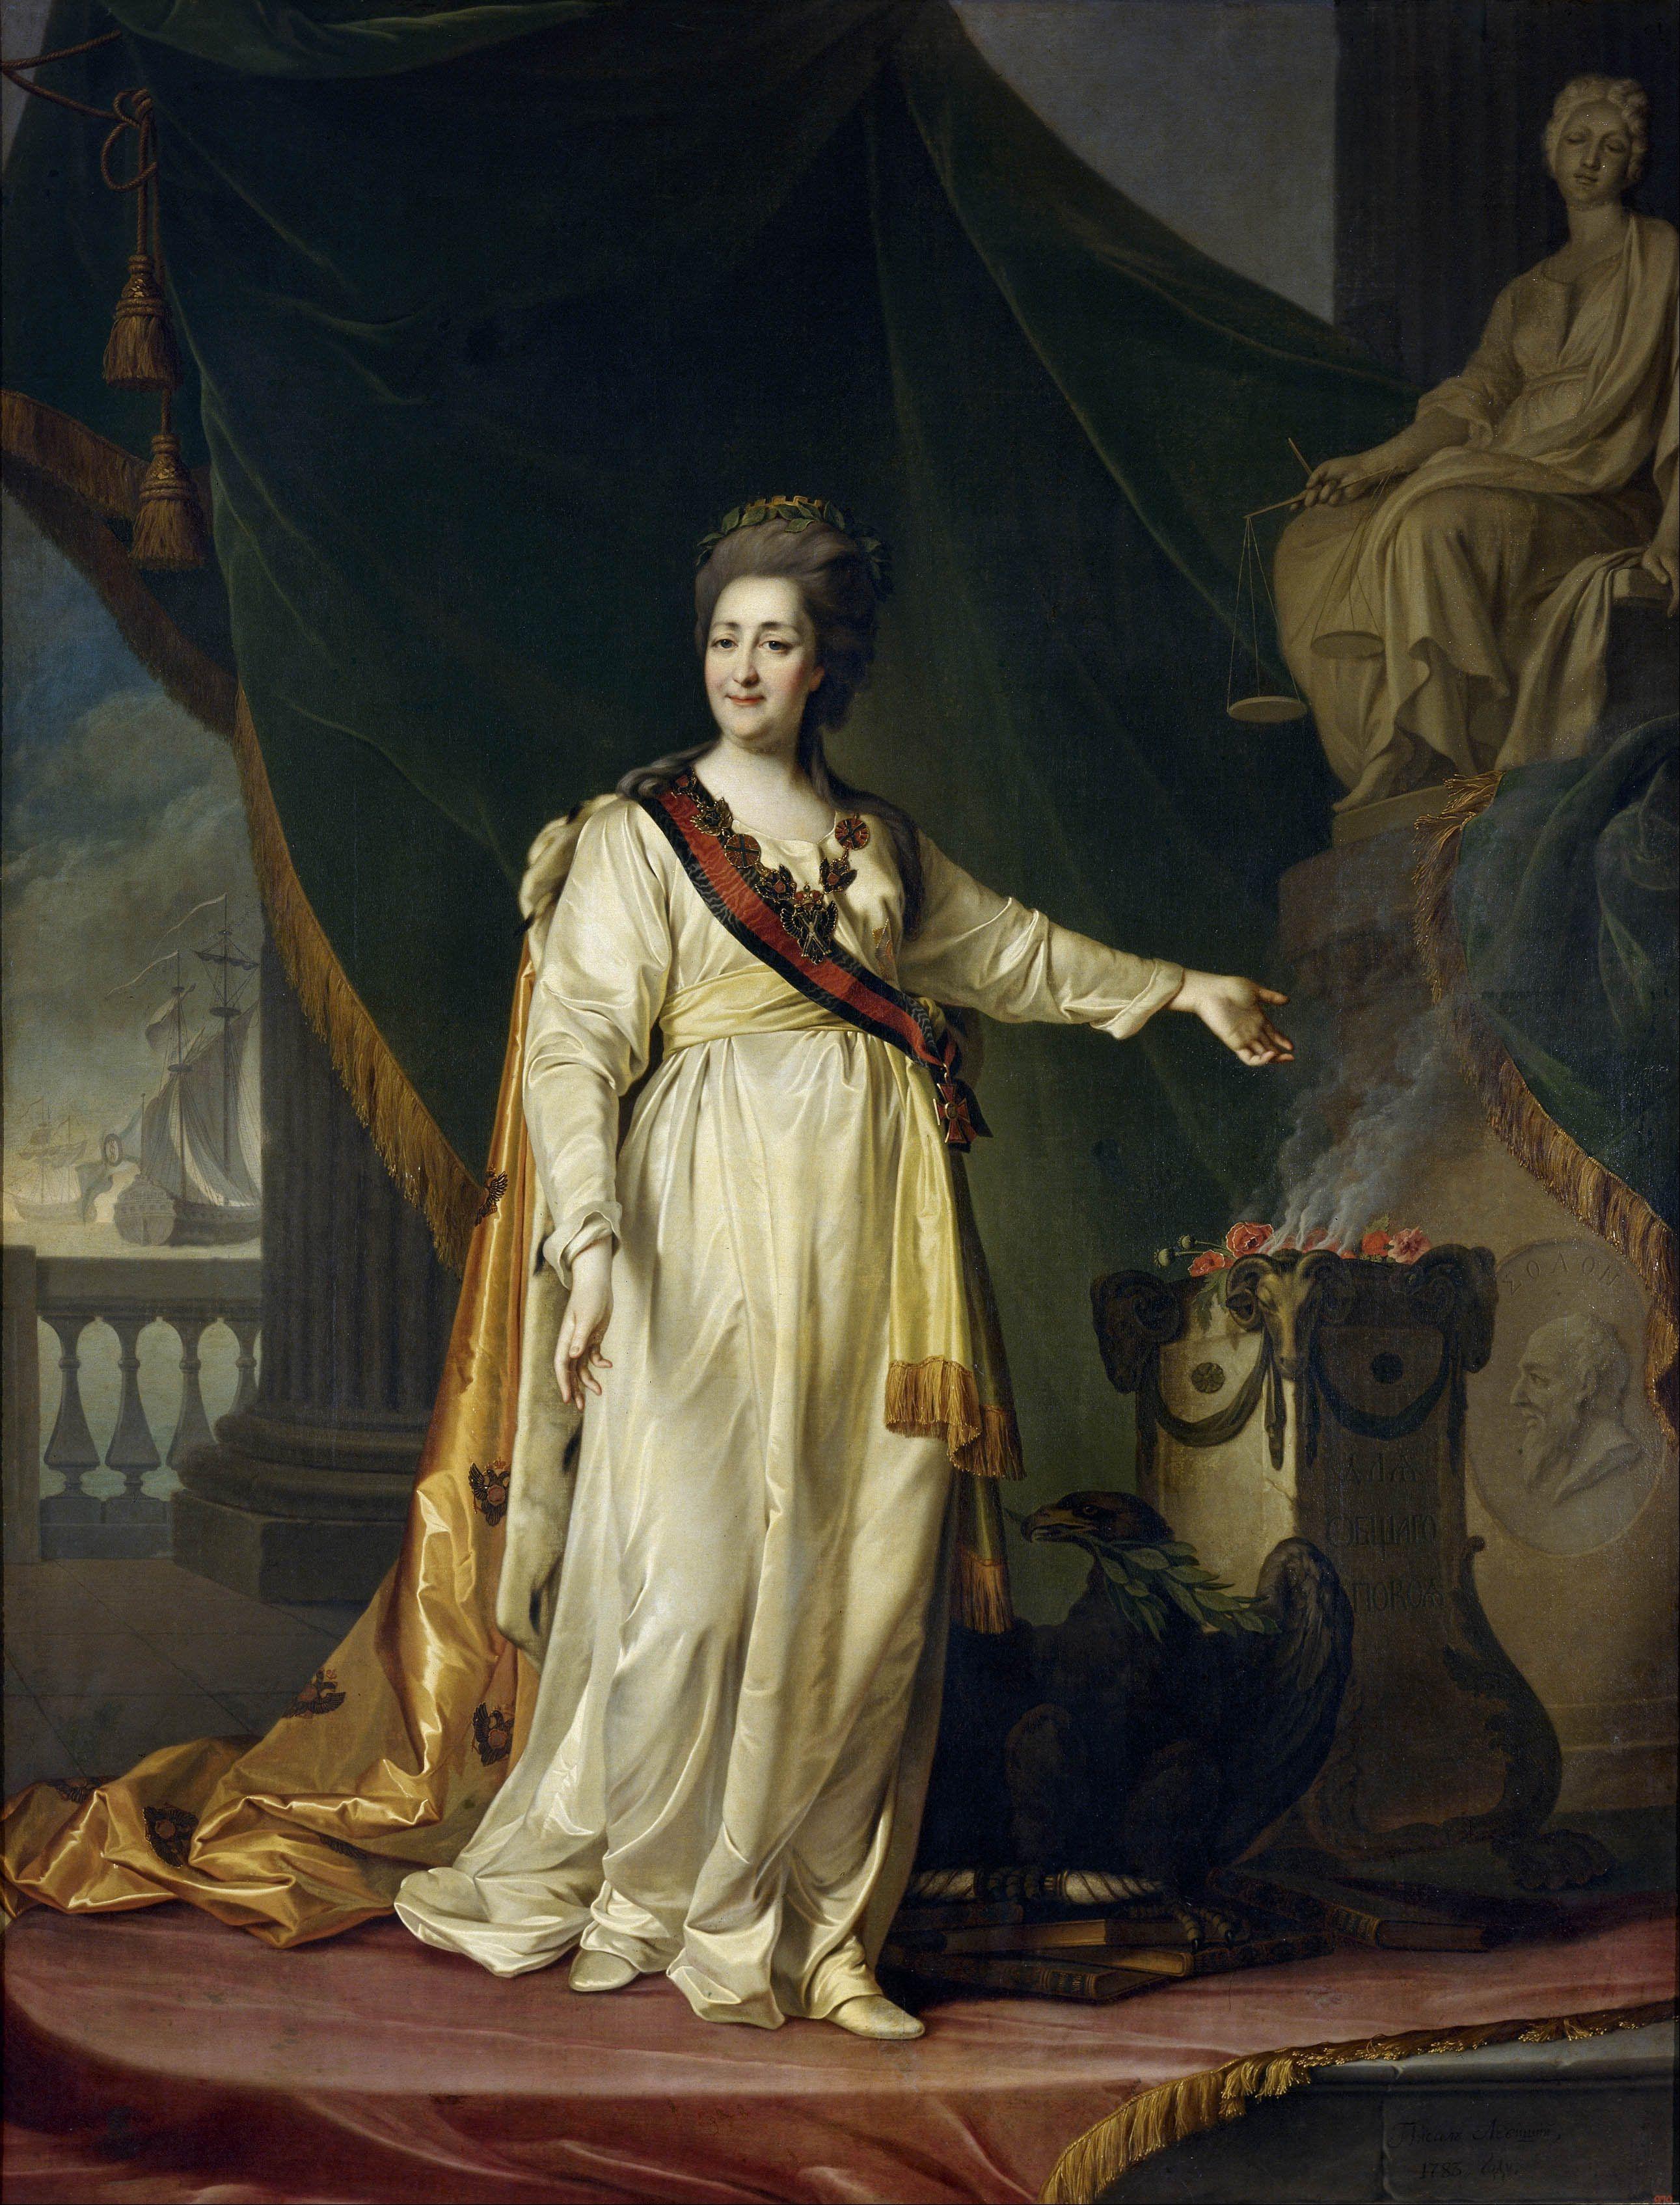 Dmitry Levitsky Portrait Of Catherine Ii The Legislatress In The Temple Of The Goddess Of Justice 1783 Catherine The Great Catherine Ii Goddess Of Justice